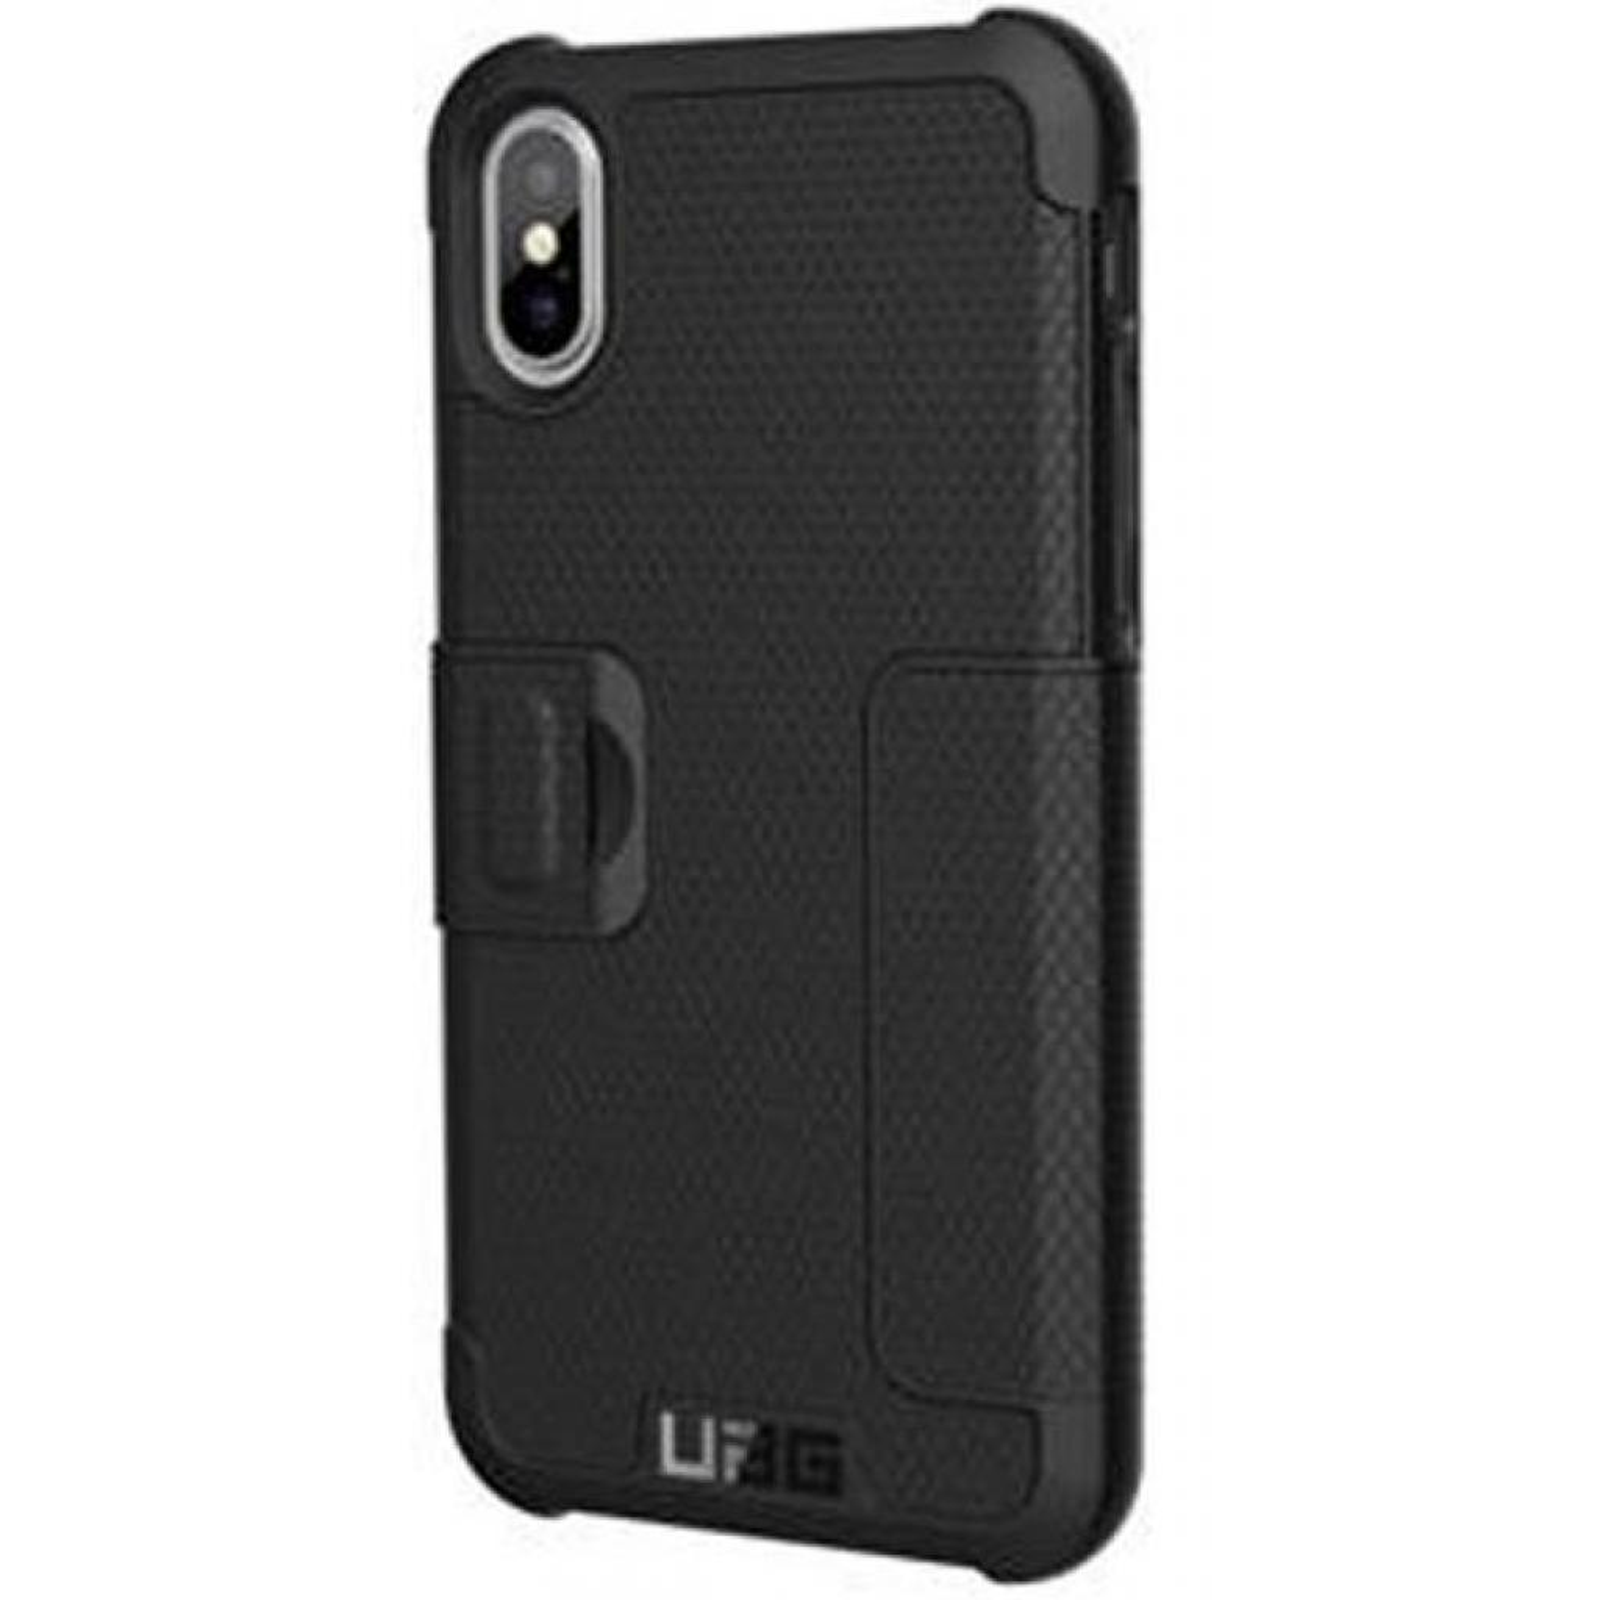 Чехол для моб. телефона Uag iPhone X Metropolis Black (IPH8-E-BL) изображение 2